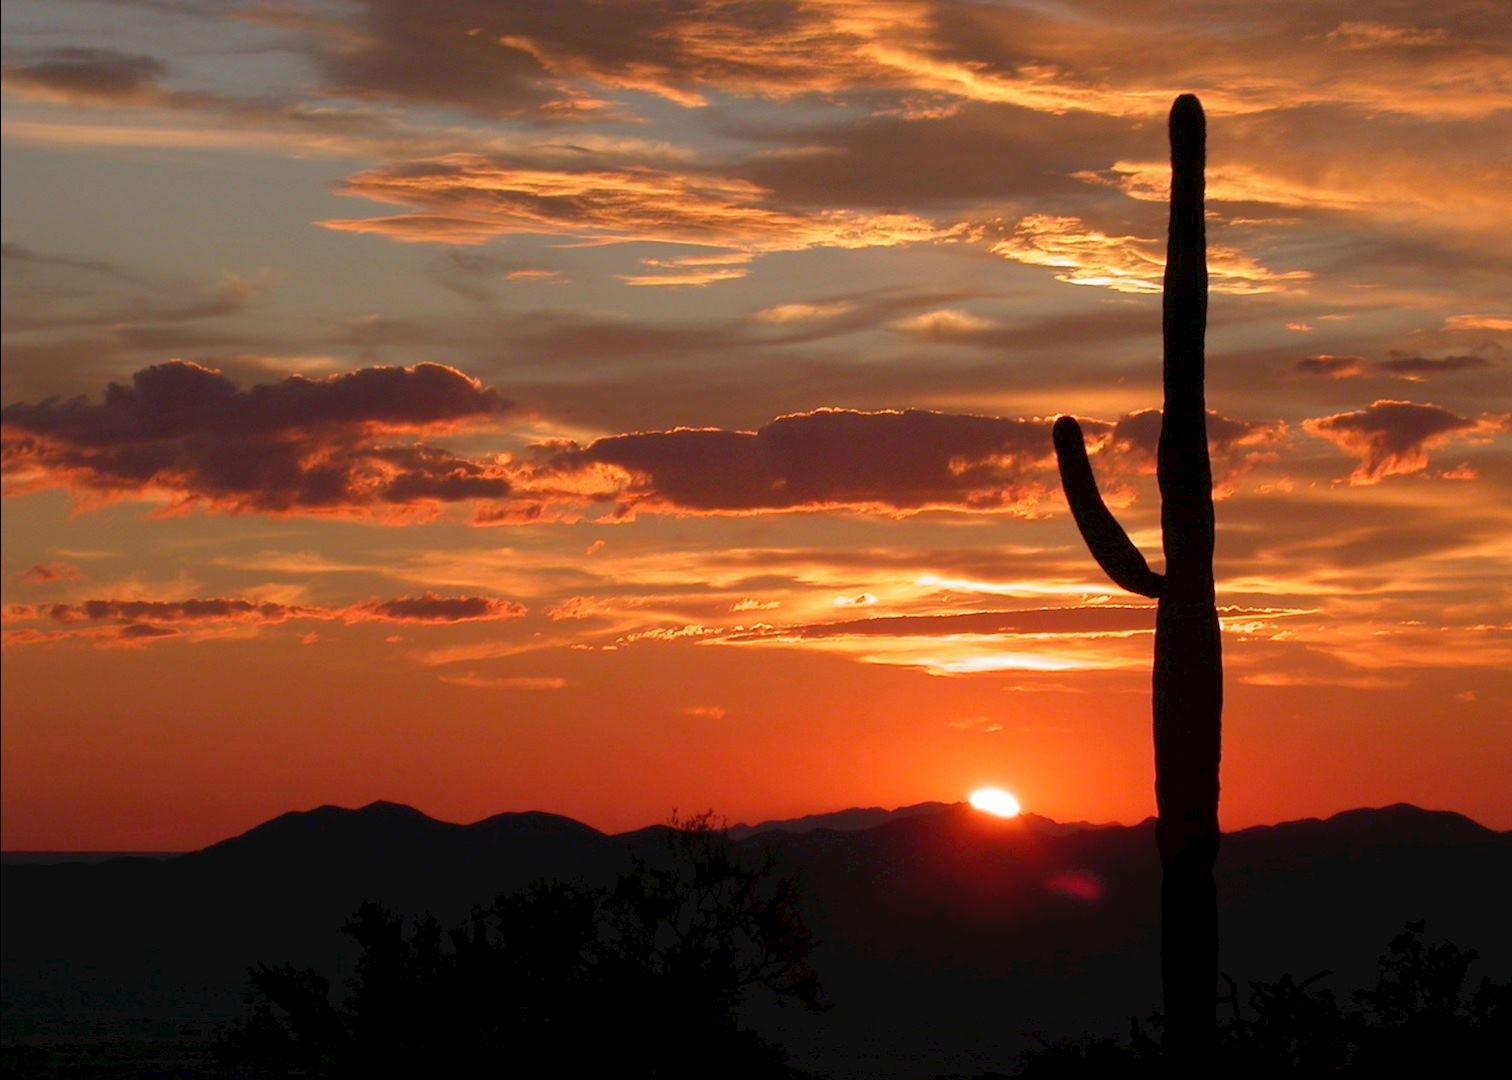 Saguaro cactus at sunset saguaro national park near tucson arizona